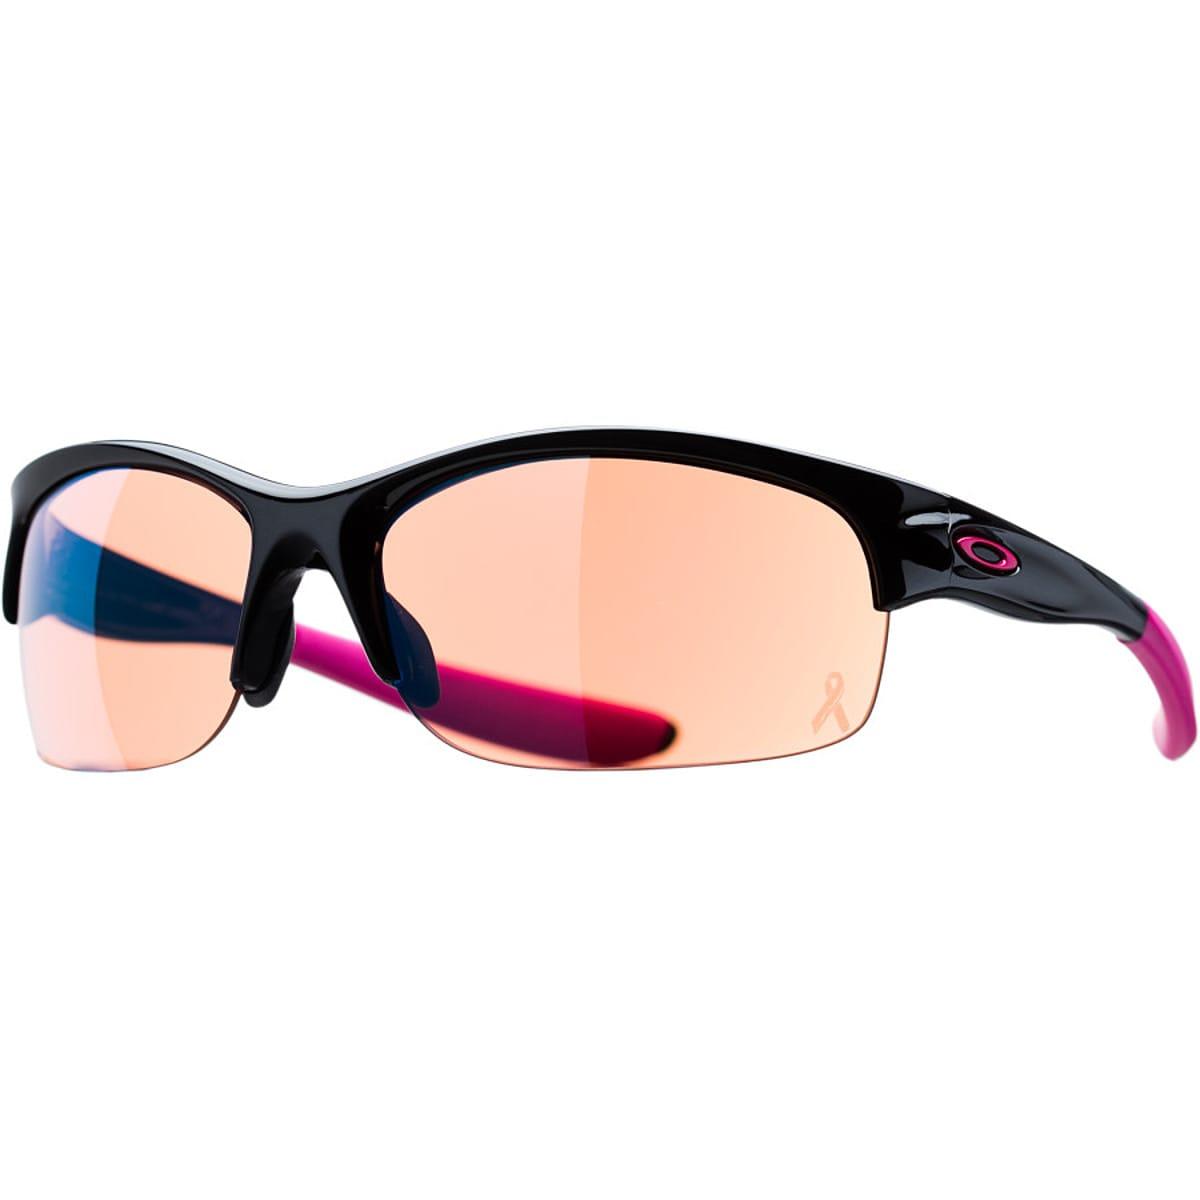 oakley womens polarized commit sq sunglasses  oakley ysc commit sq signature women's sunglasses